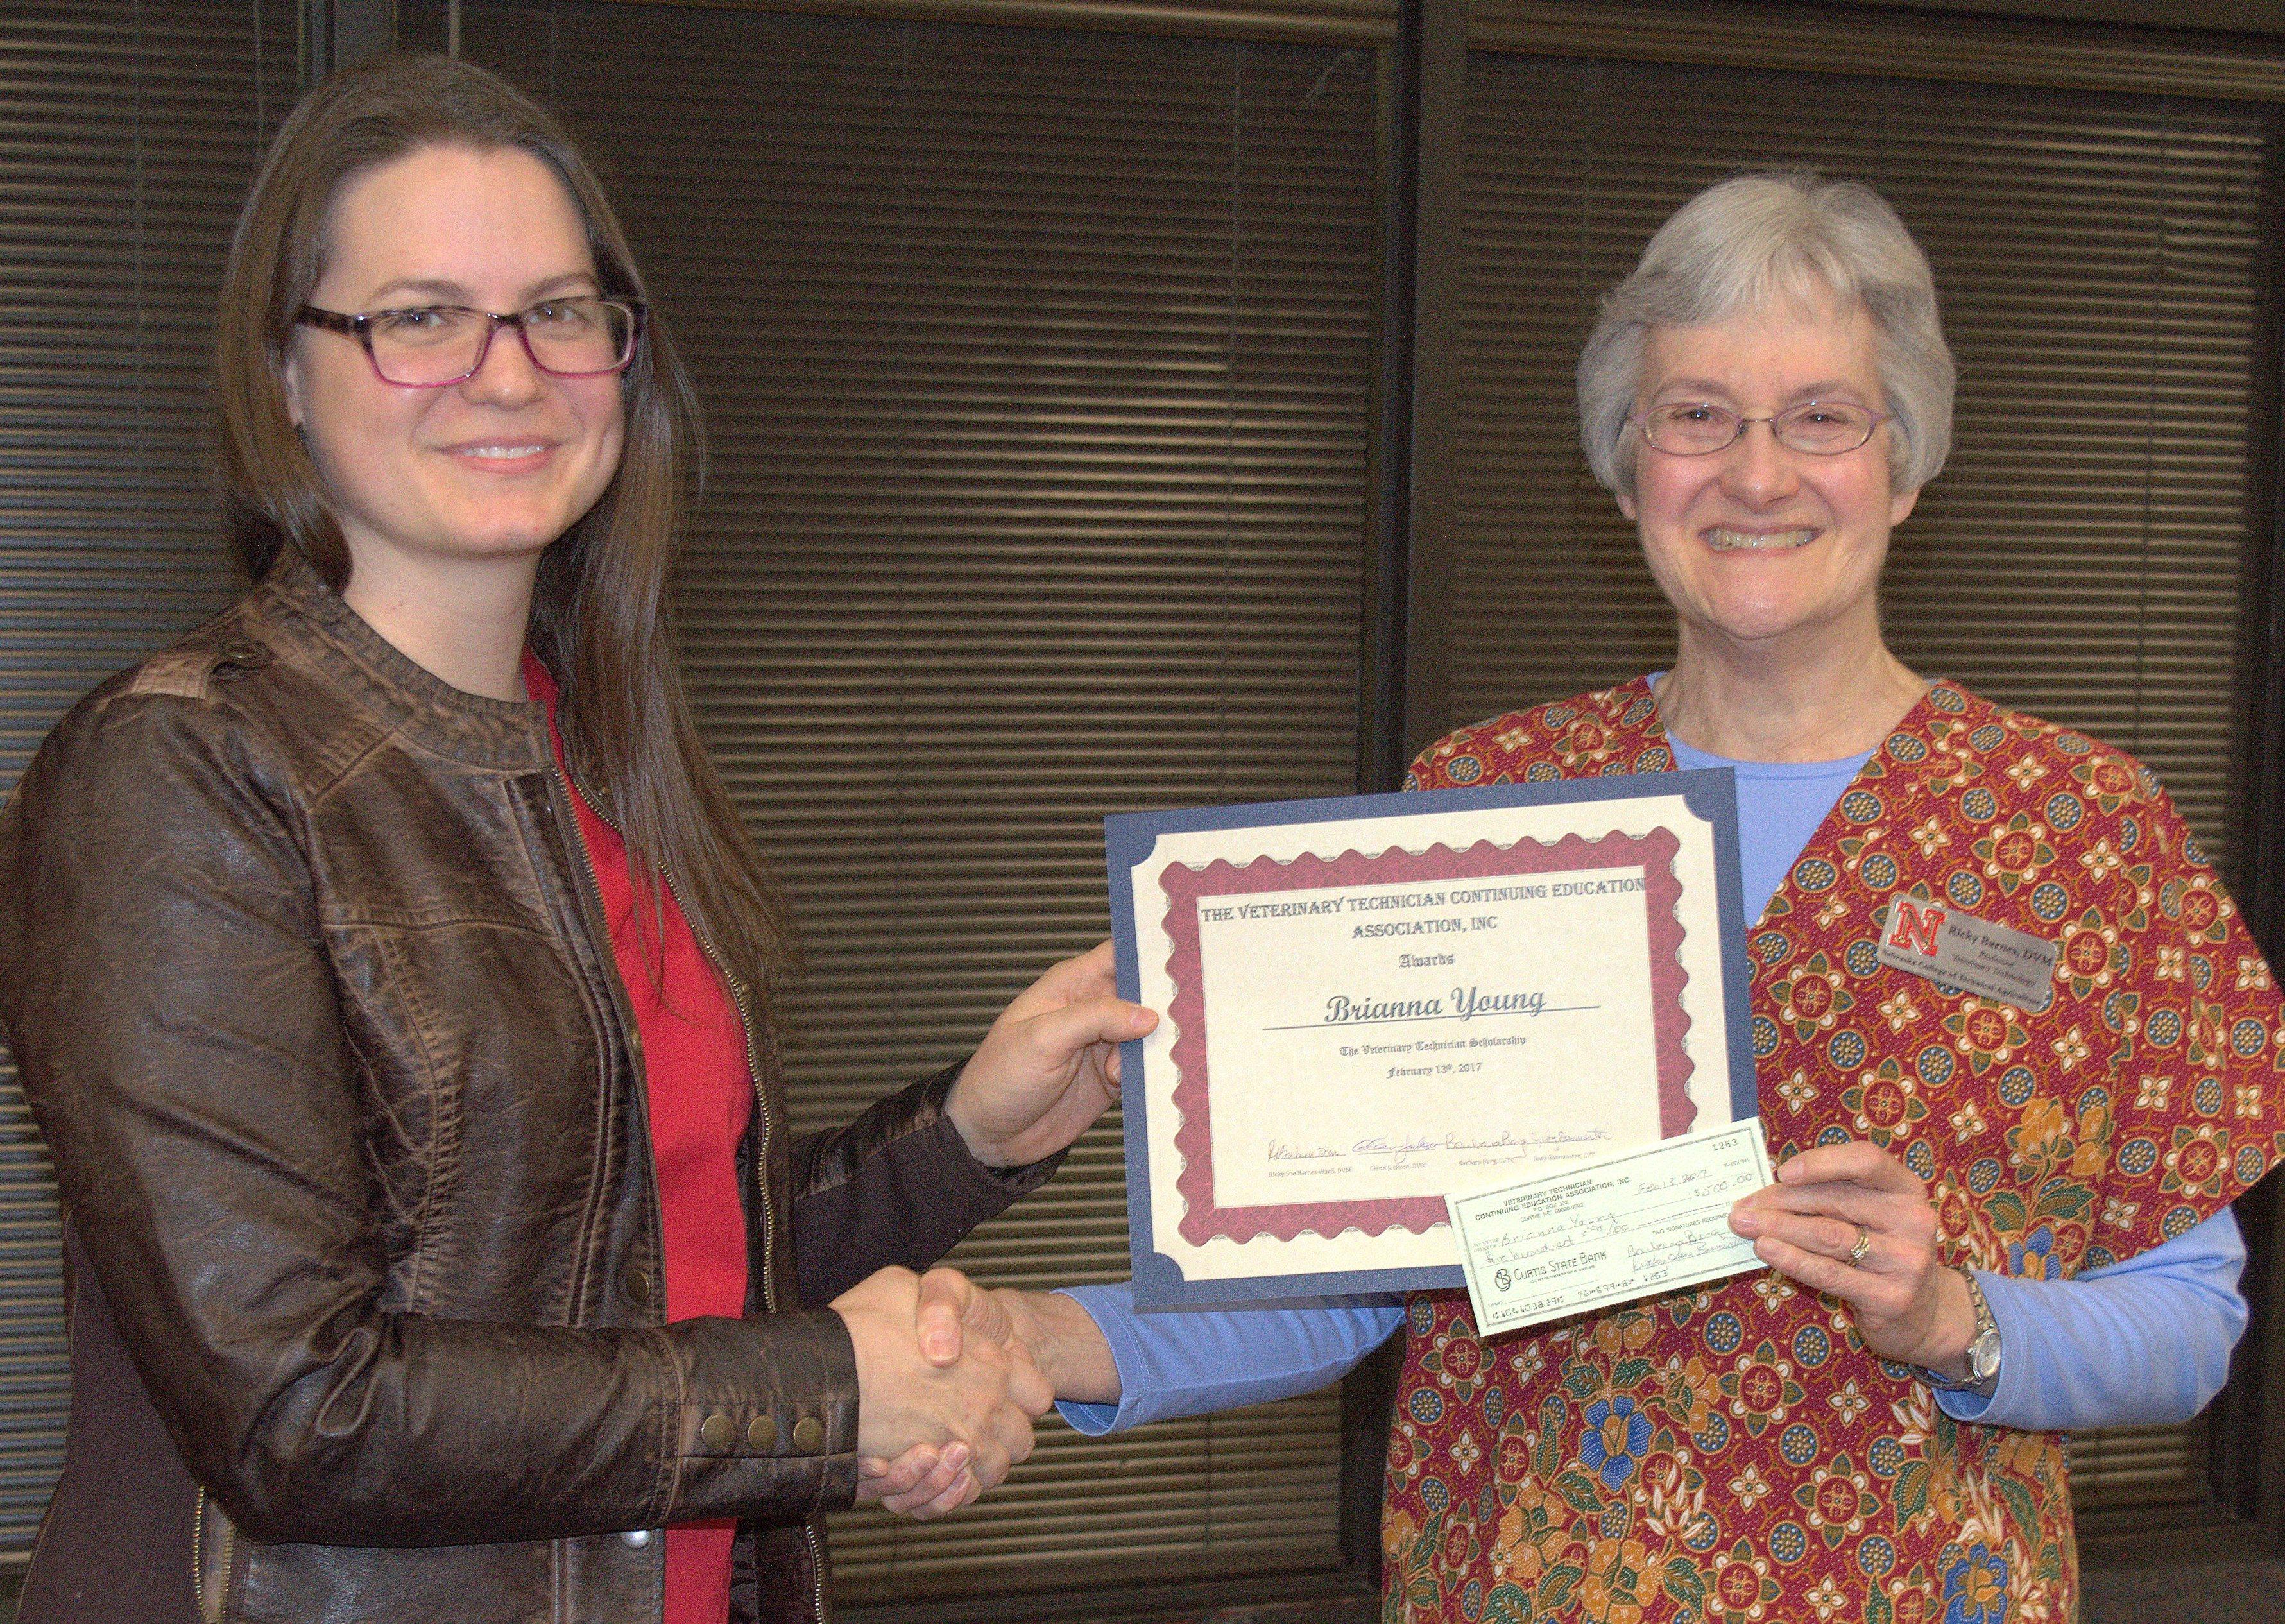 Brianna Young accepts her scholarship from NCTA Professor Ricky Sue Barnes, DVM. (Hauptman/NCTA News photo)